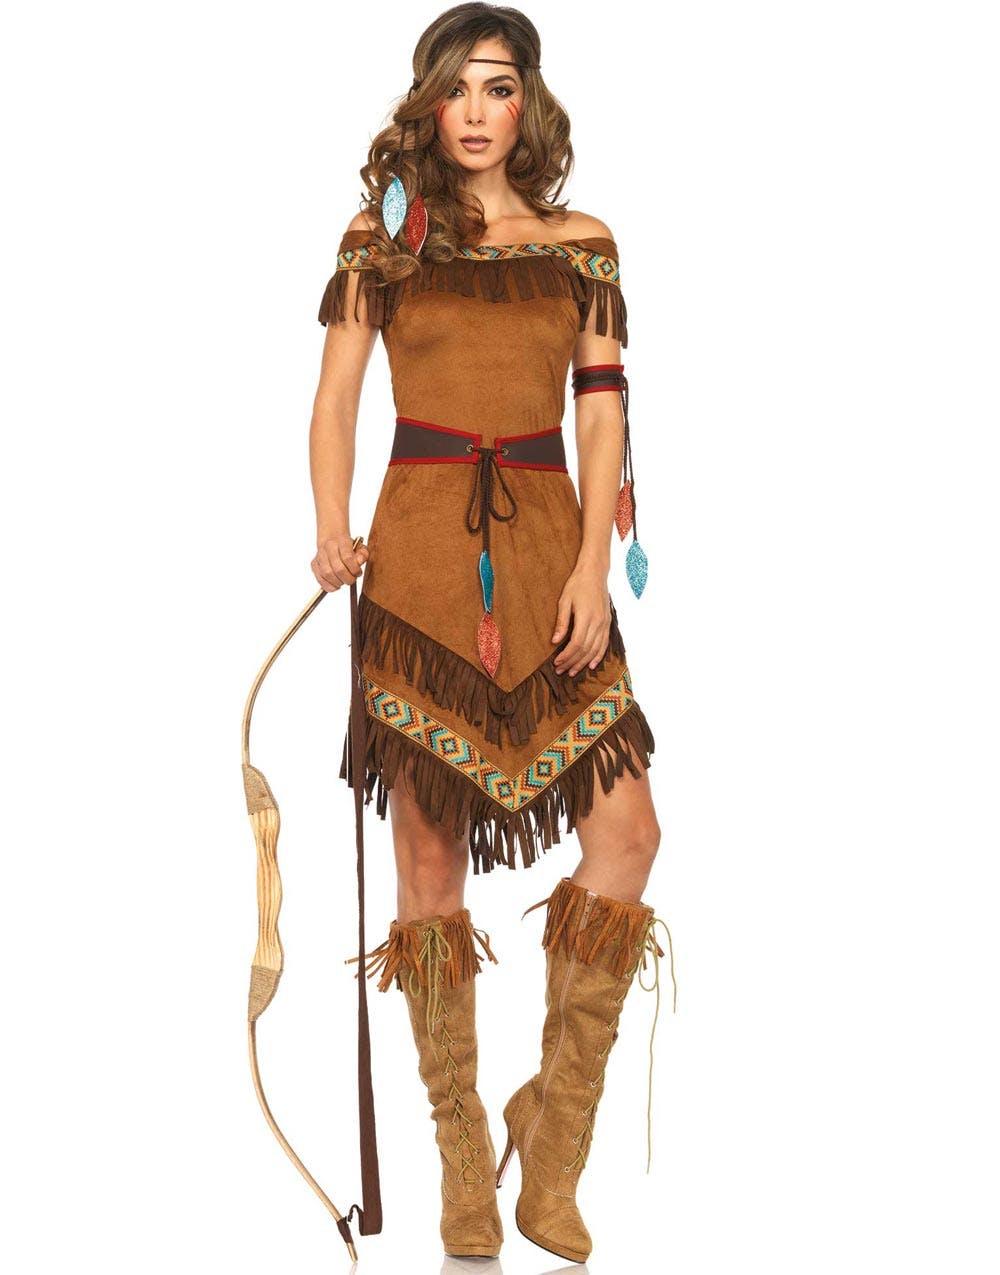 aeef4f9f Indianer Prinsesse - Luksuskostyme